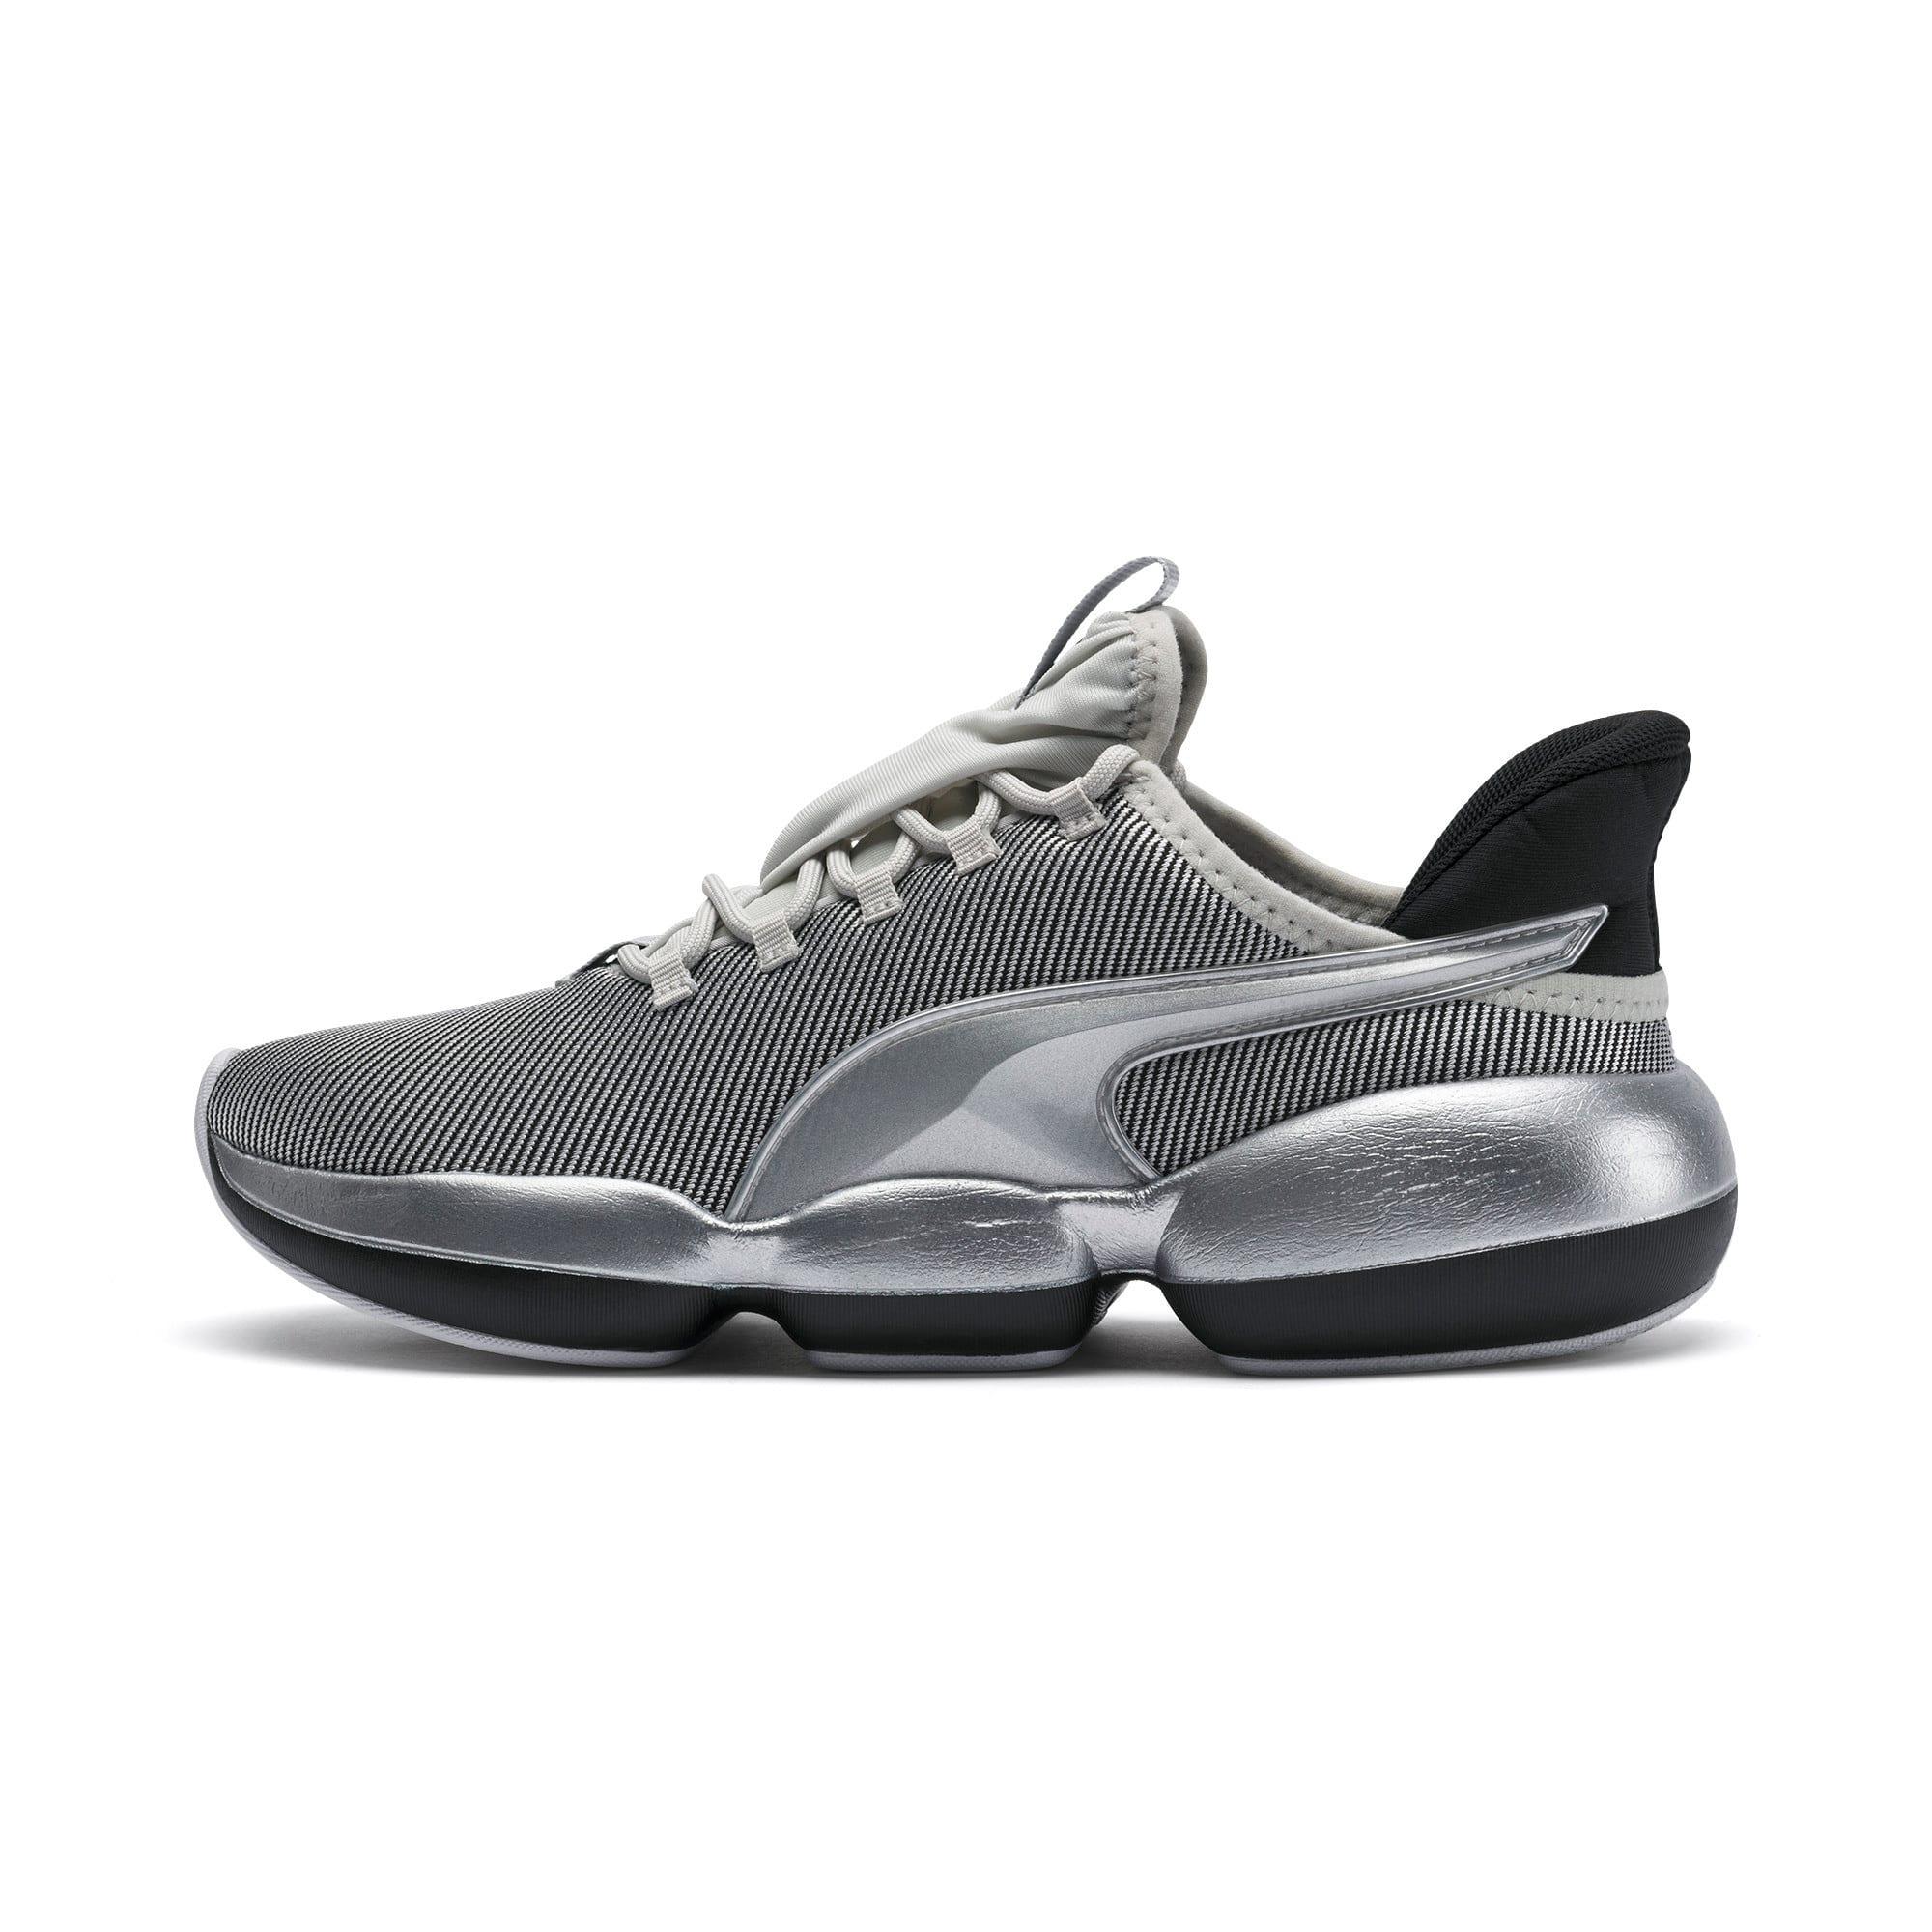 Thumbnail 1 of Mode XT Lust Women's Training Shoes, Glacier Gray-Puma Black, medium